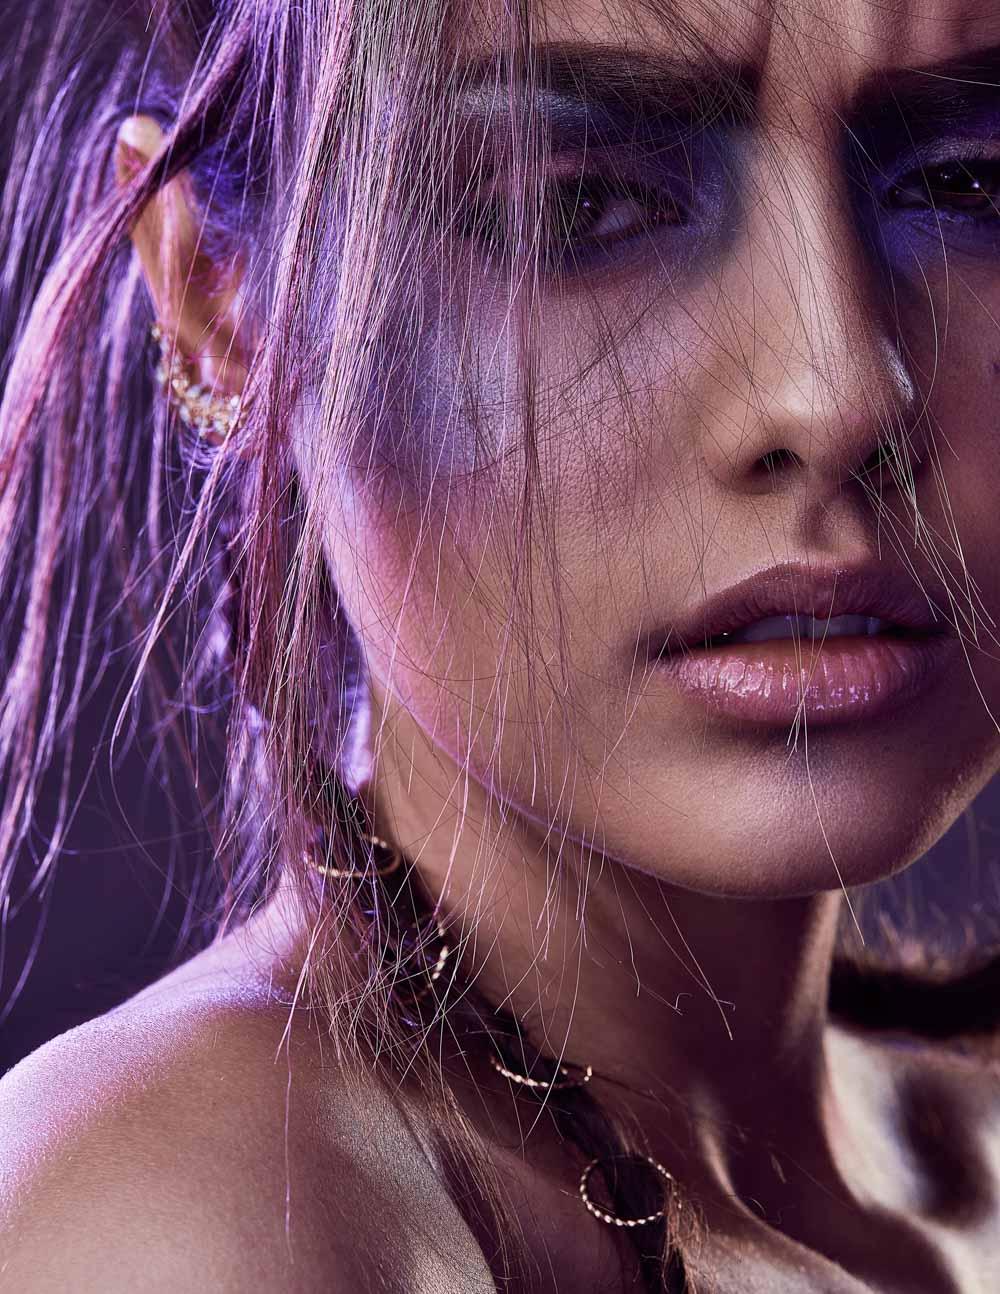 editorial-simone-haas-bianca-puchmueller-models-makeup-metallized-makeup-portrait-lizz-sator-prontolux11_spectrum_byLizzKrobath.jpg